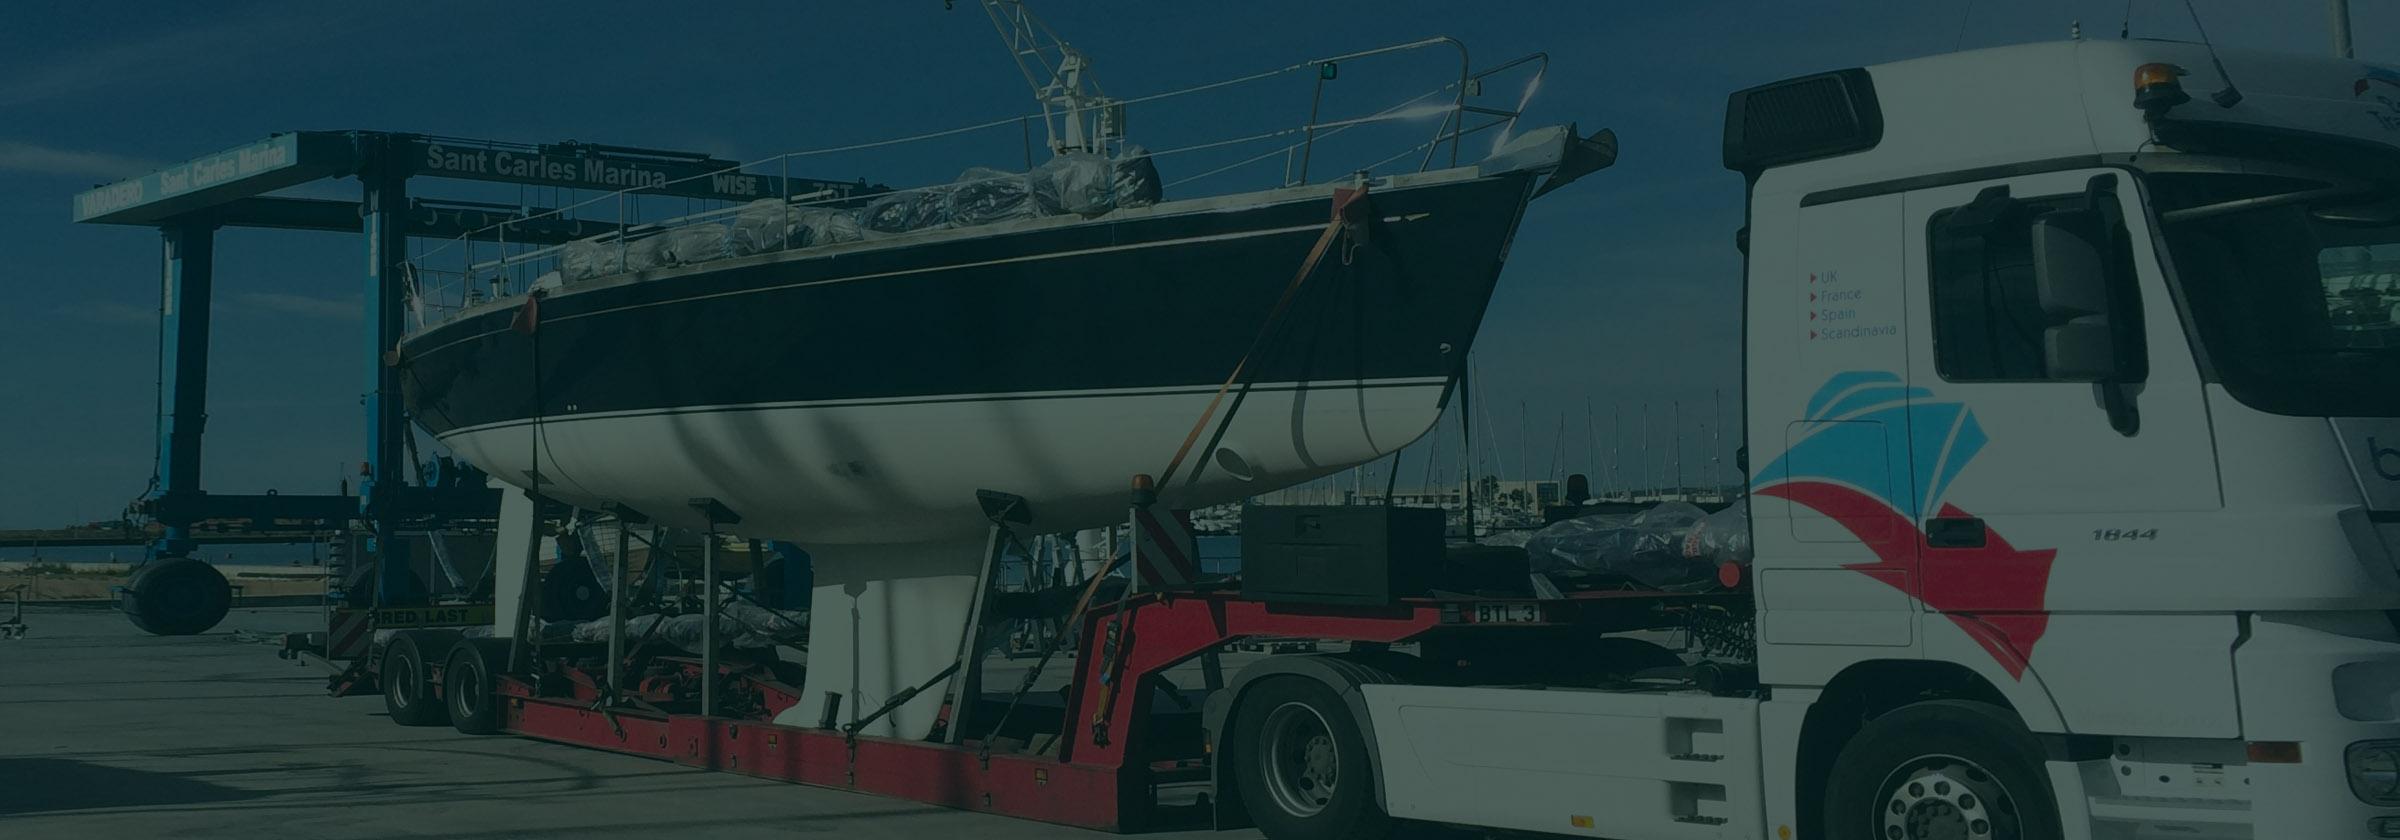 Transport Services - Seven Seas Marine Group